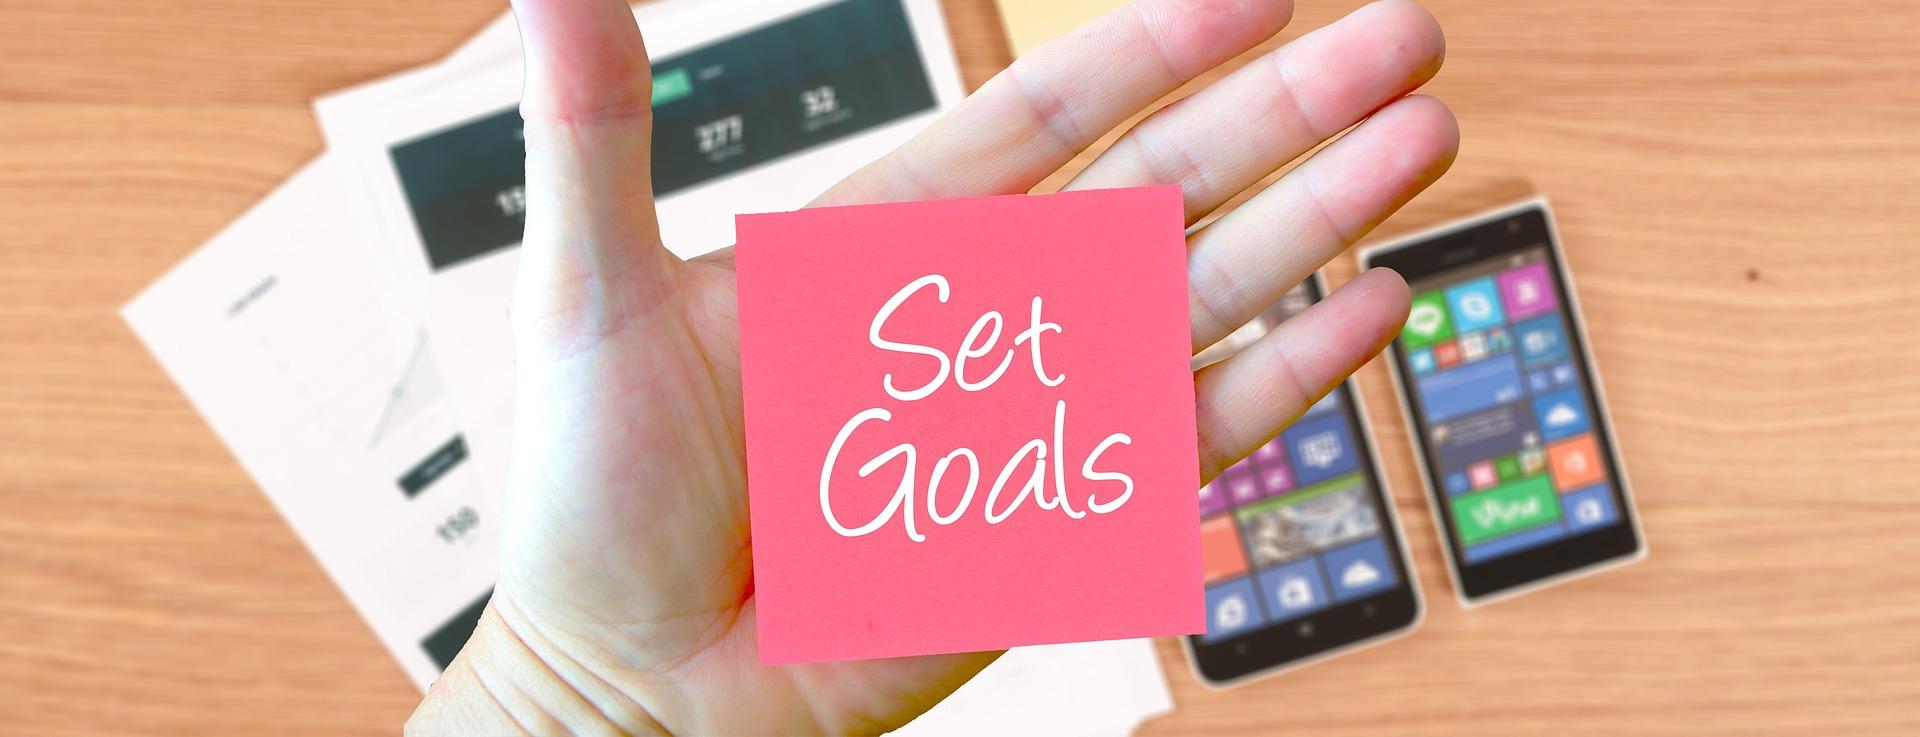 C9 Cleanse goal setting